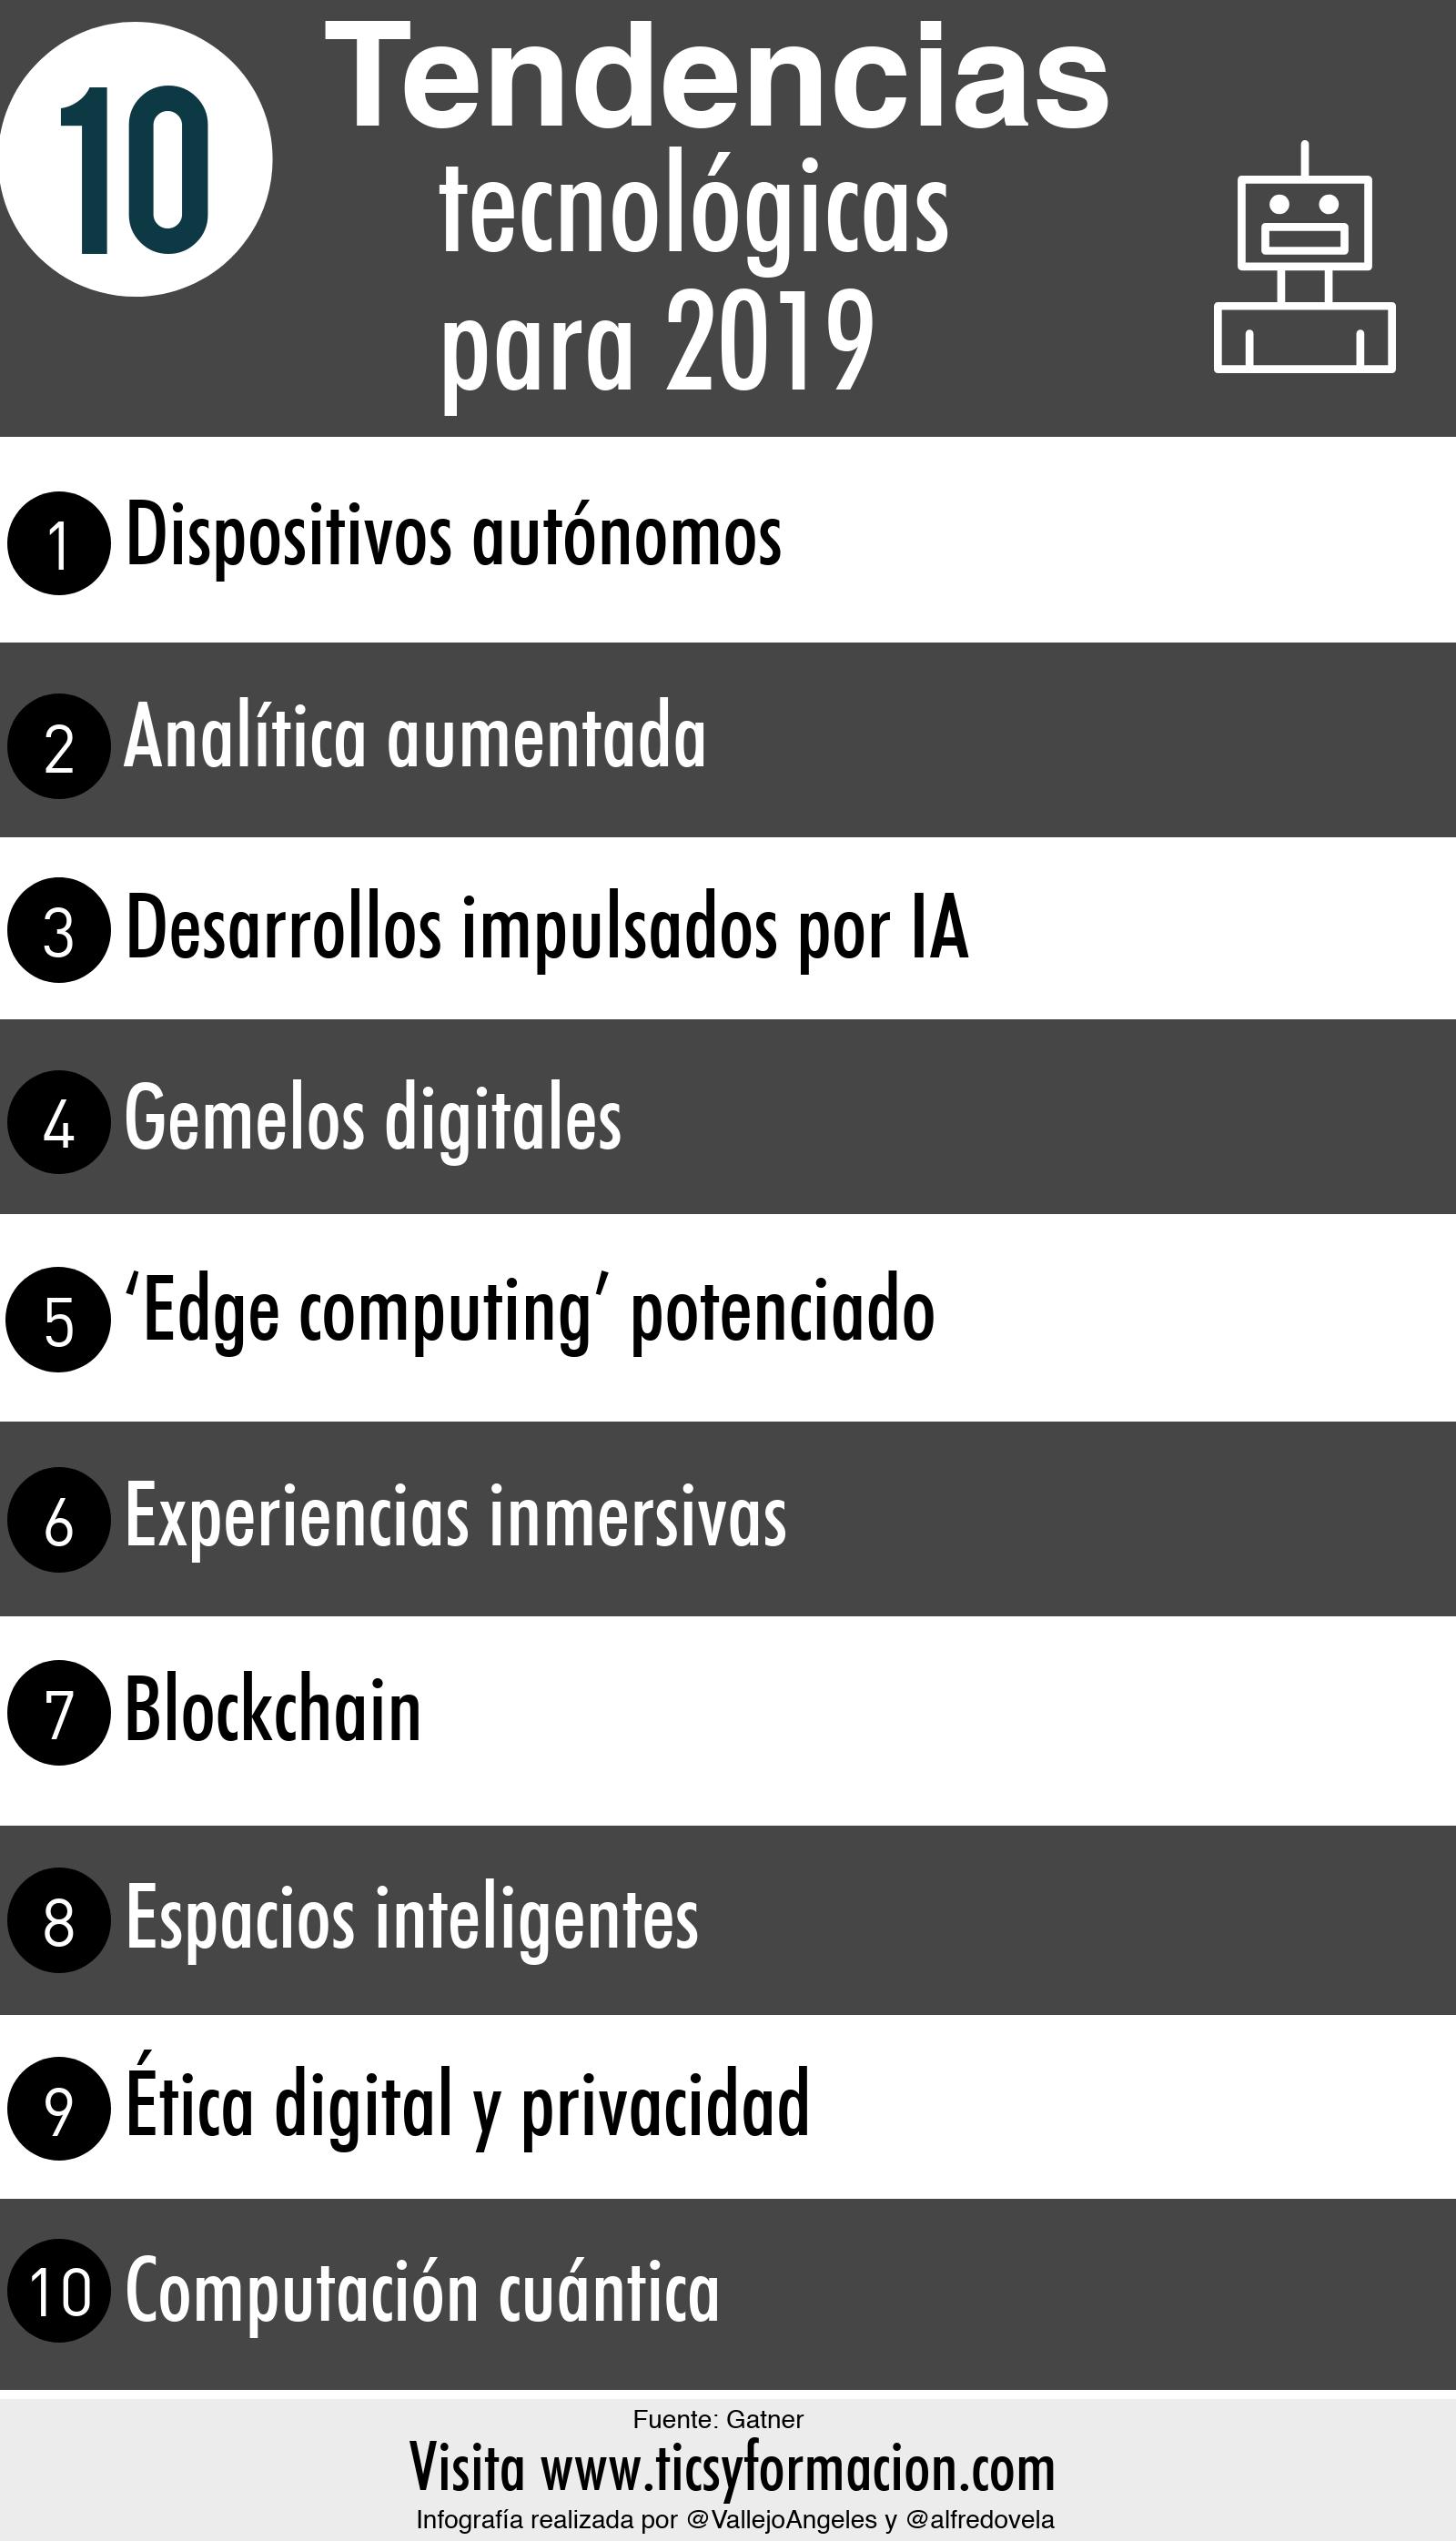 10 tendencias tecnológicas para 2019